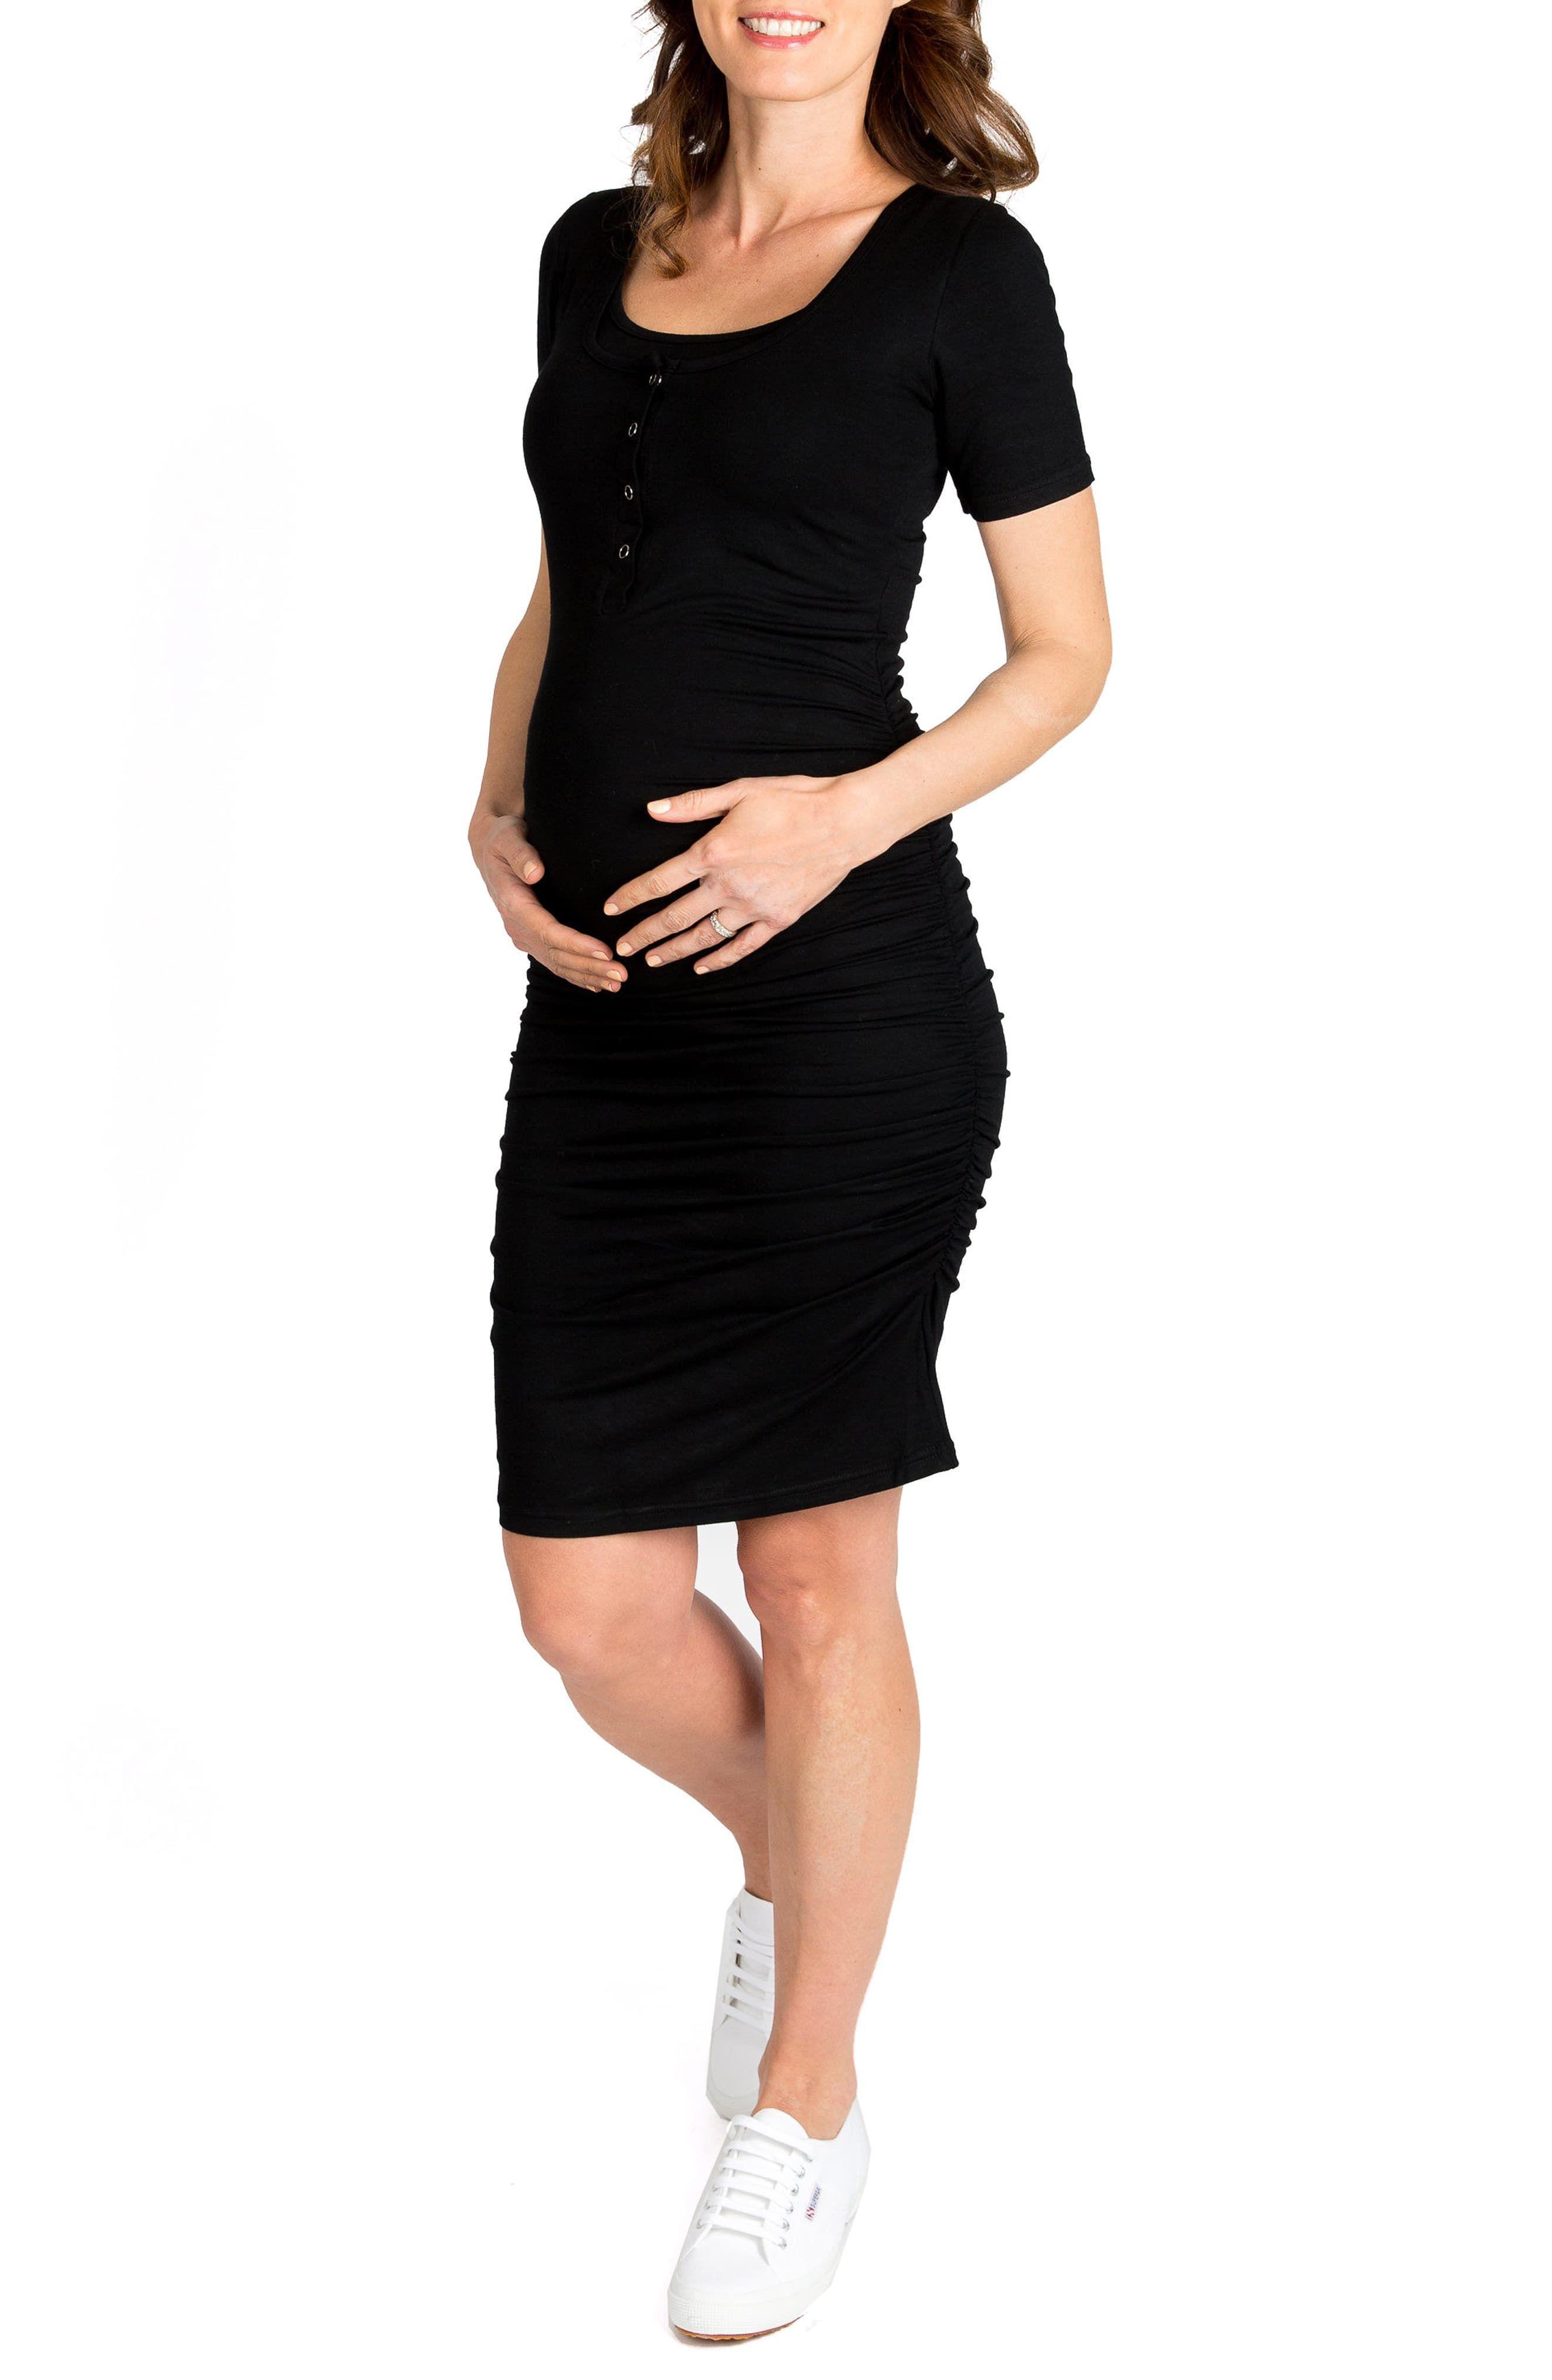 d33105543d843 Women's Nom Maternity Snap Maternity/nursing Shirtdress, Size X-Small -  Black